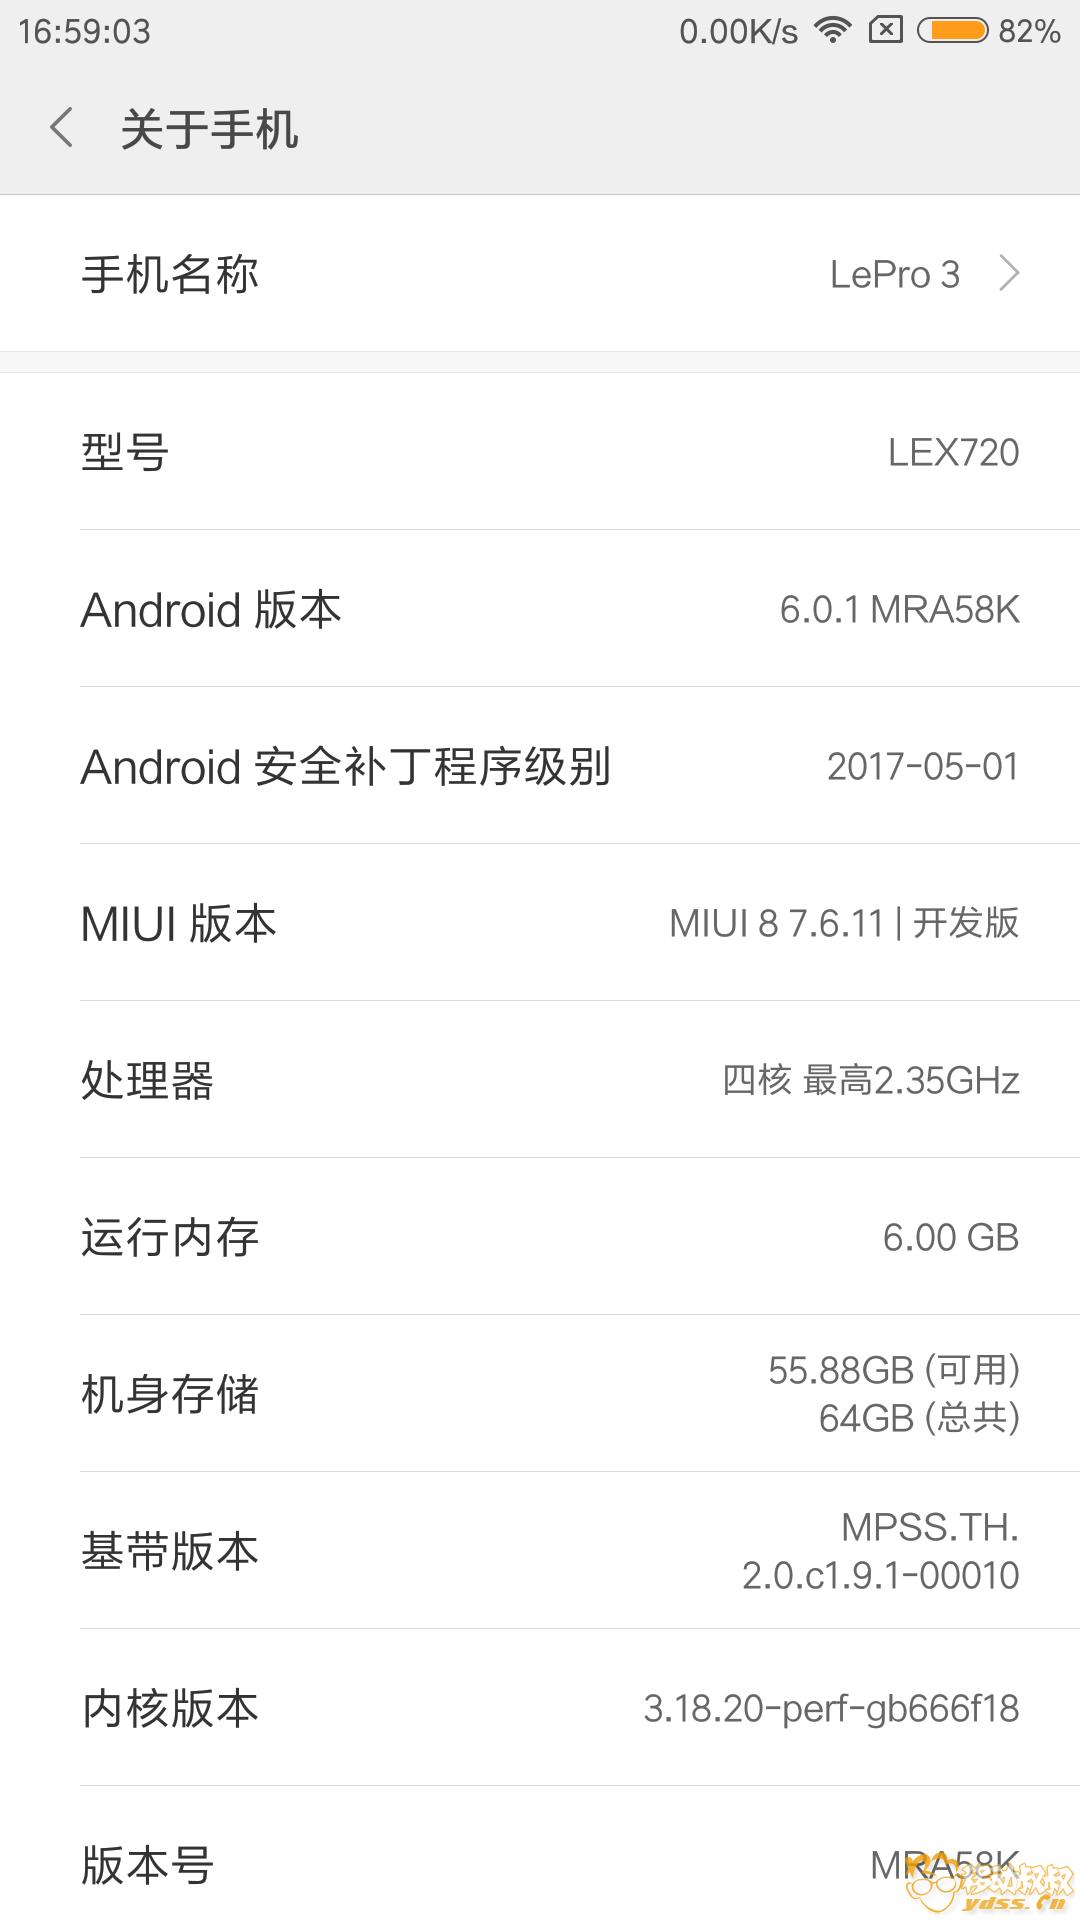 Screenshot_2017-10-06-16-59-04-573_com.android.settings.png